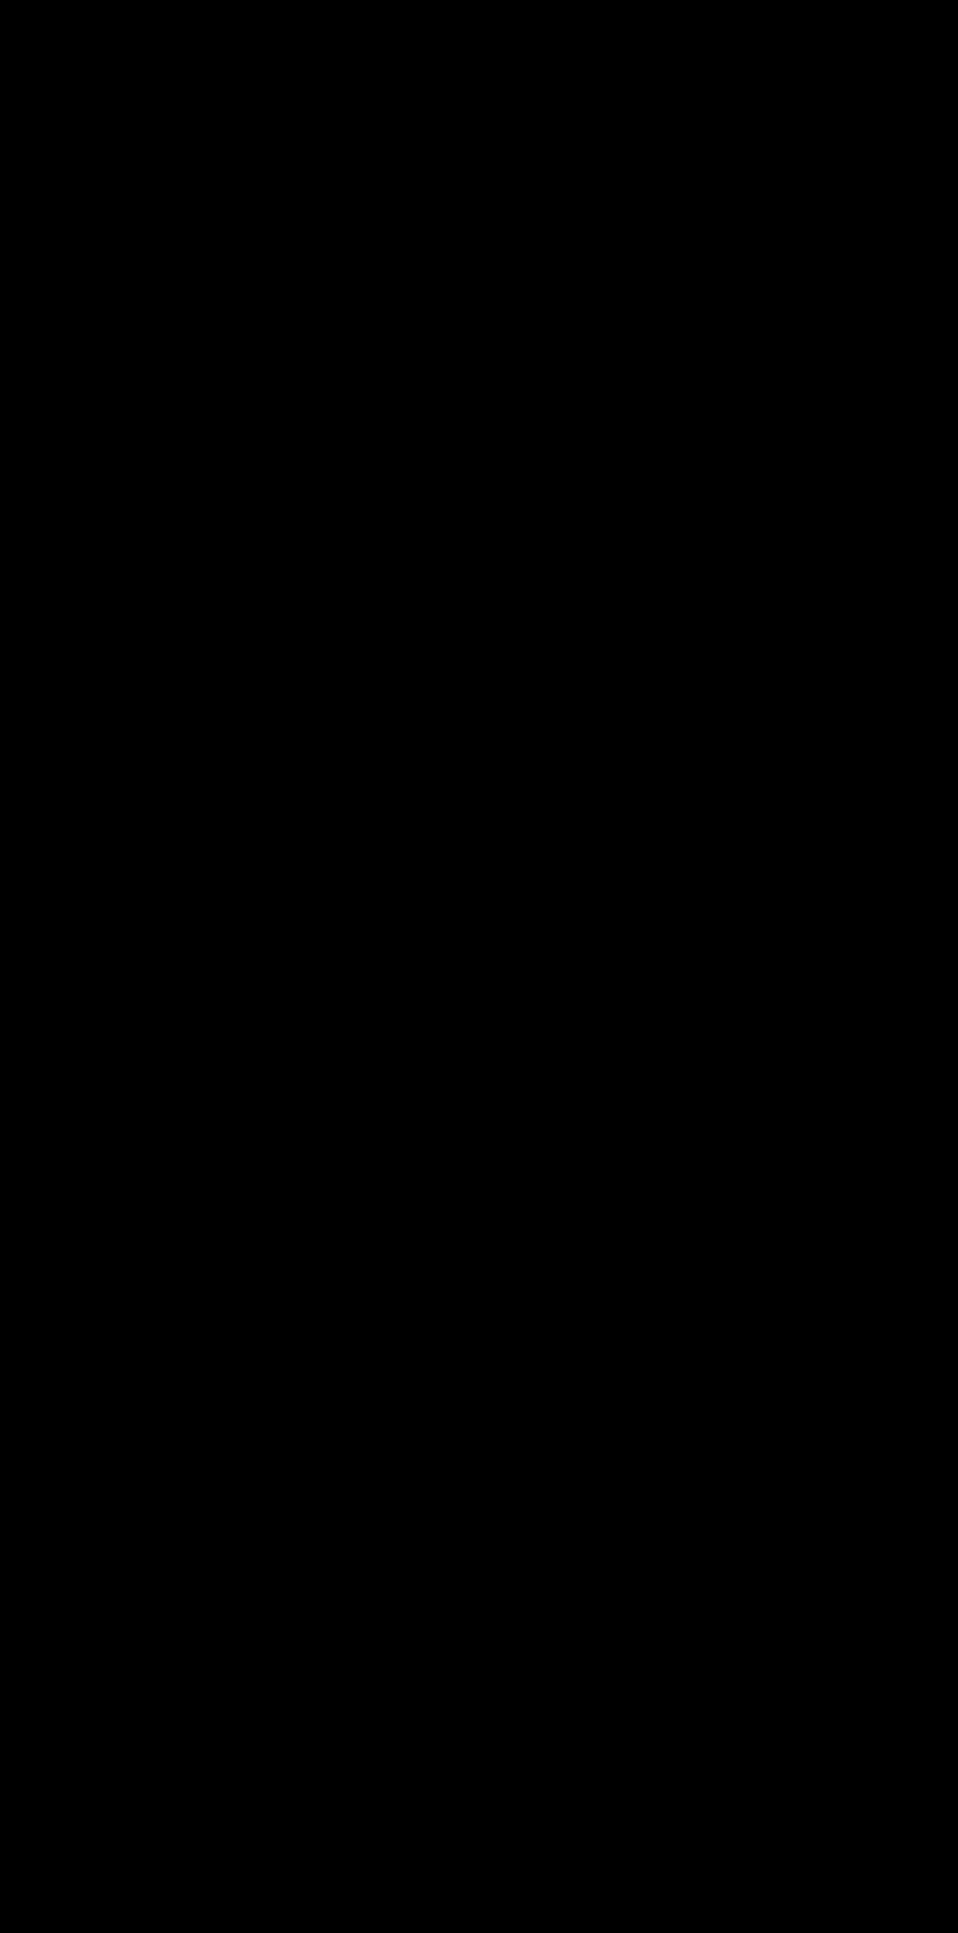 Clipart fox grape. Public domain clip art